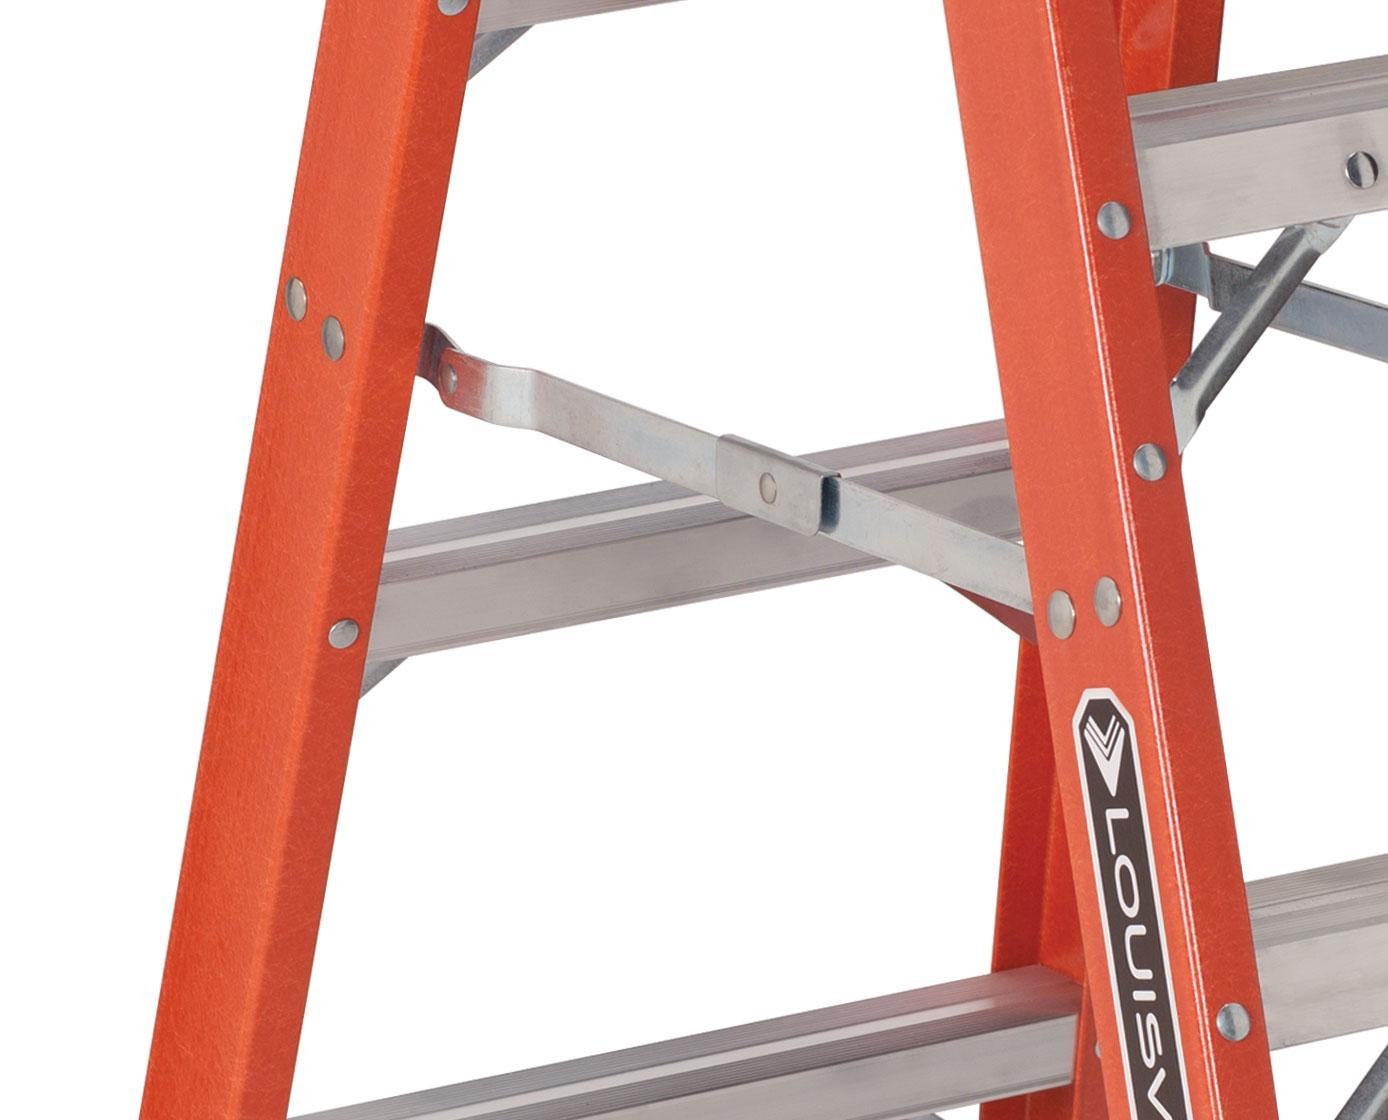 Louisville Ladder Fm1416hd Fiberglass Twin Front Ladder 16 Feet 375 Pound Duty